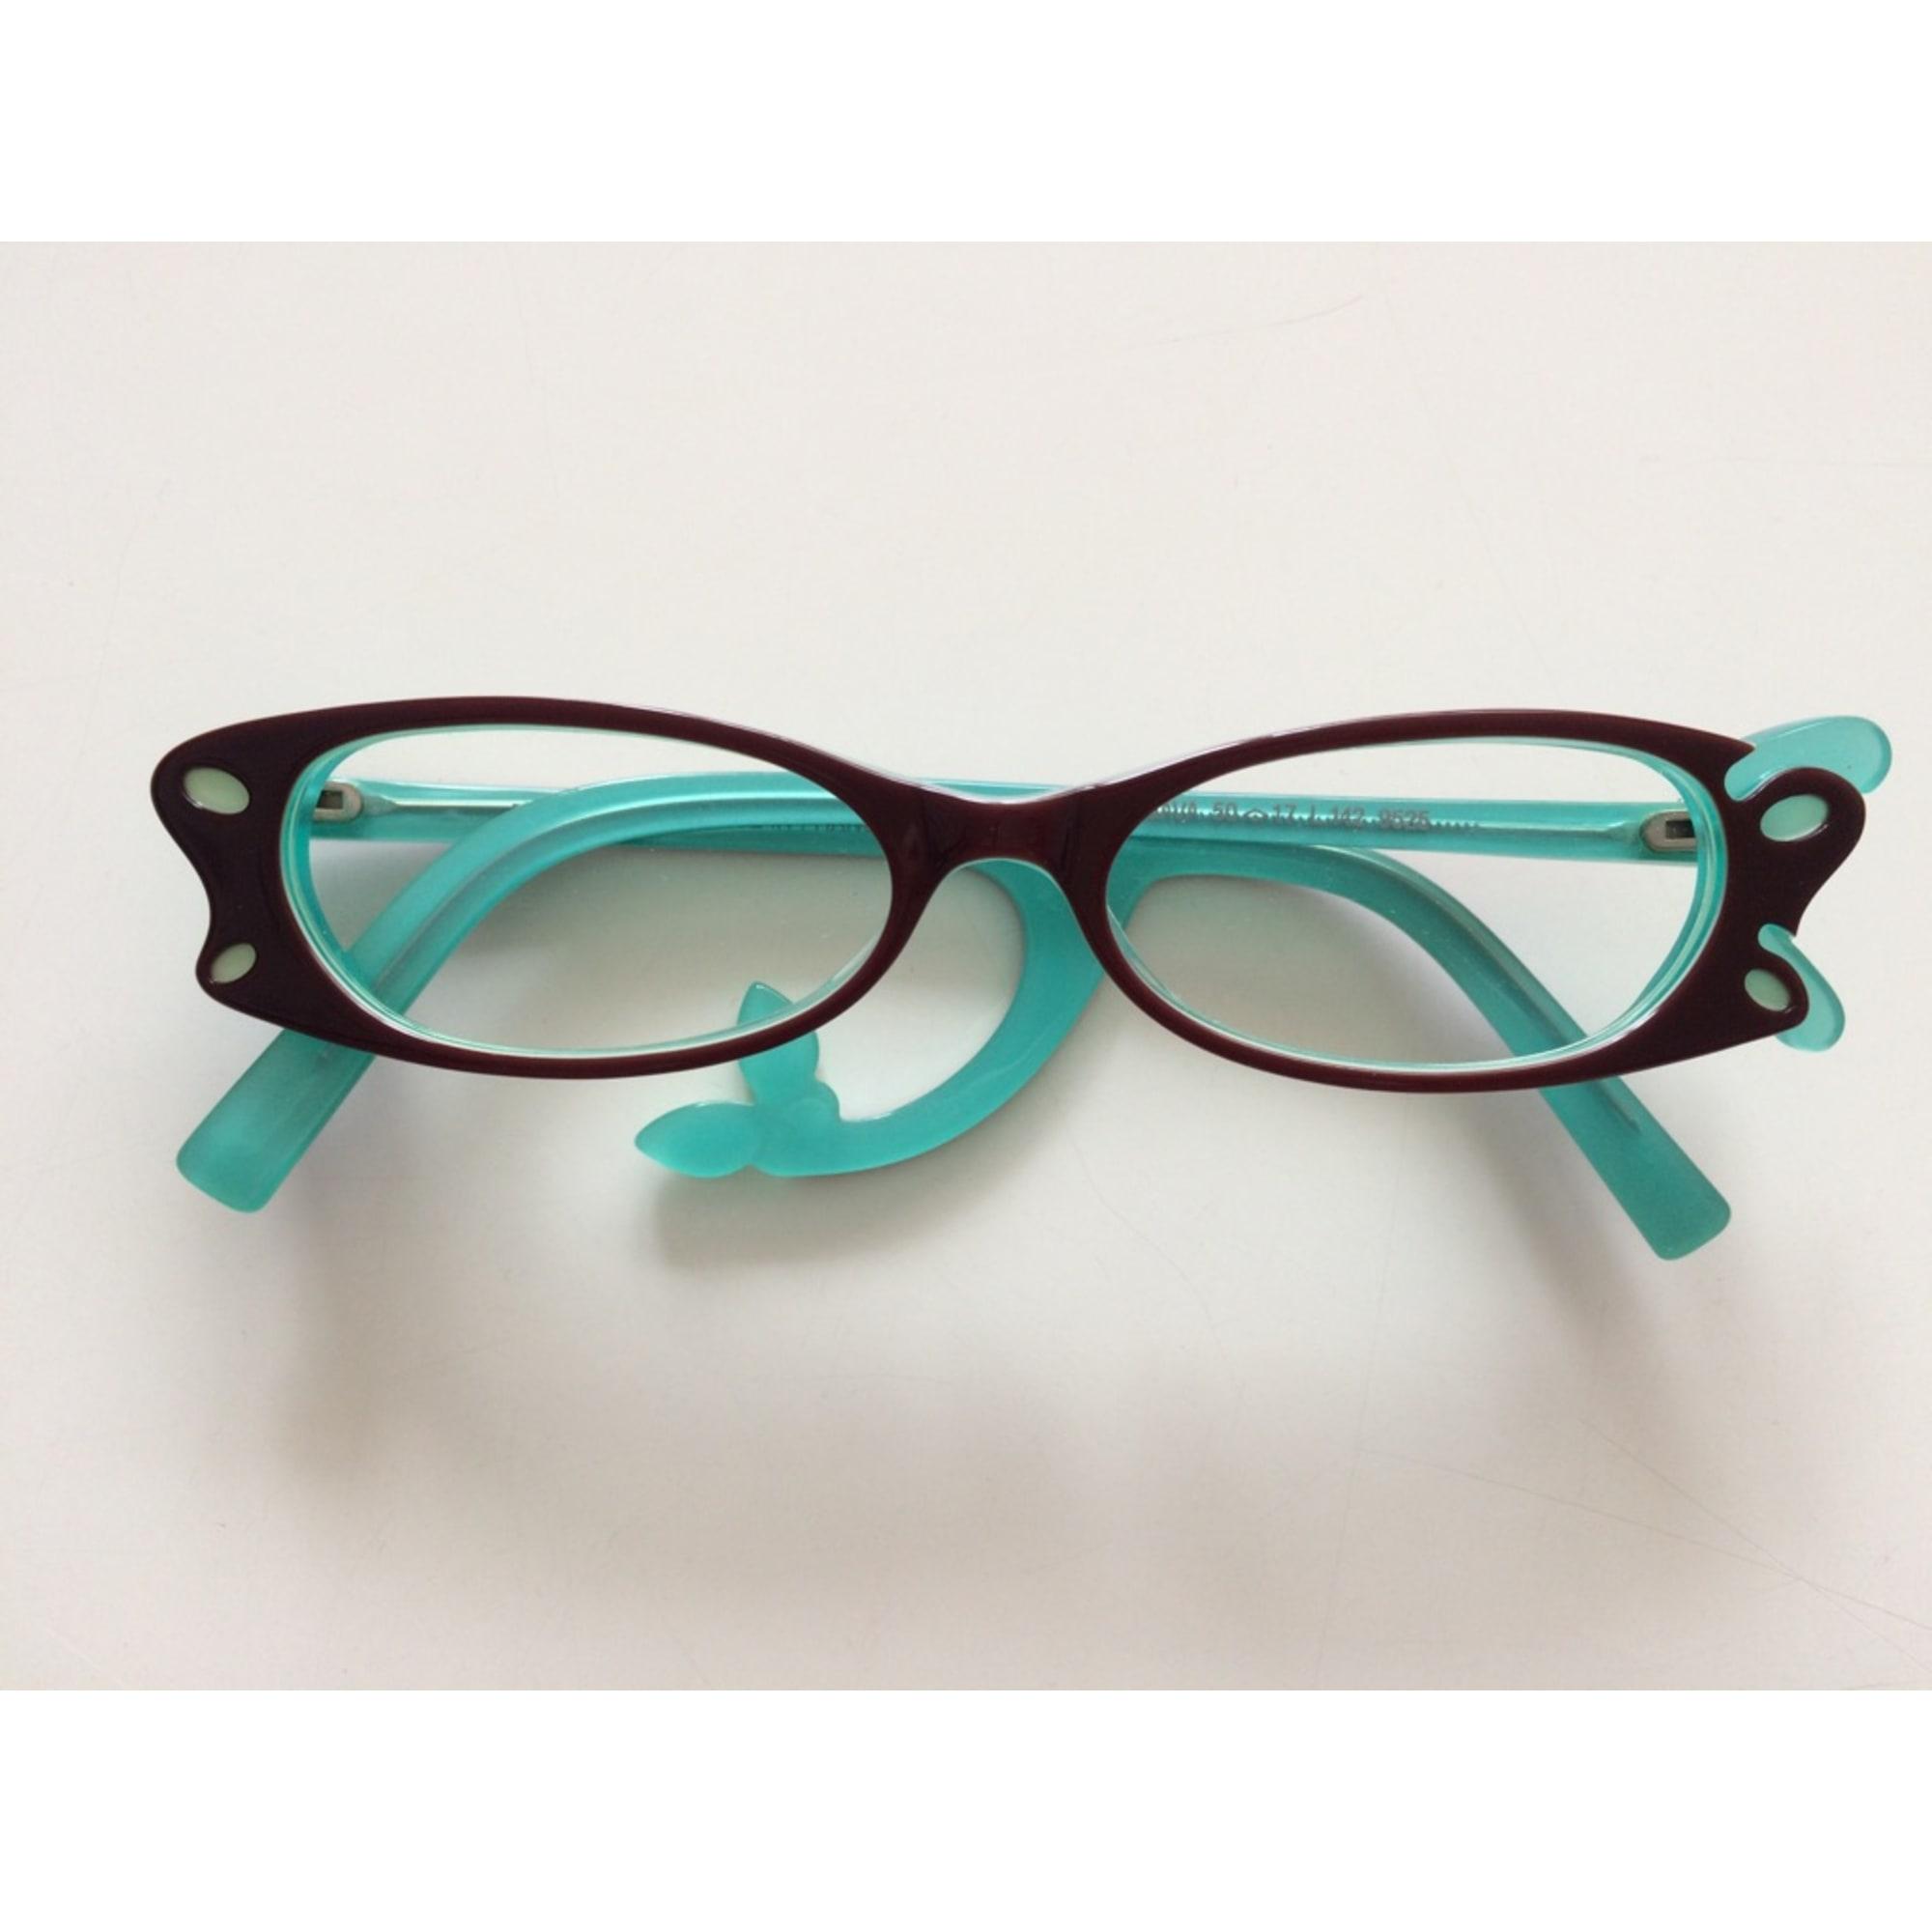 Monture de lunettes BOZ EYEWEAR multicouleur - 6503598 fedf9b705e5b